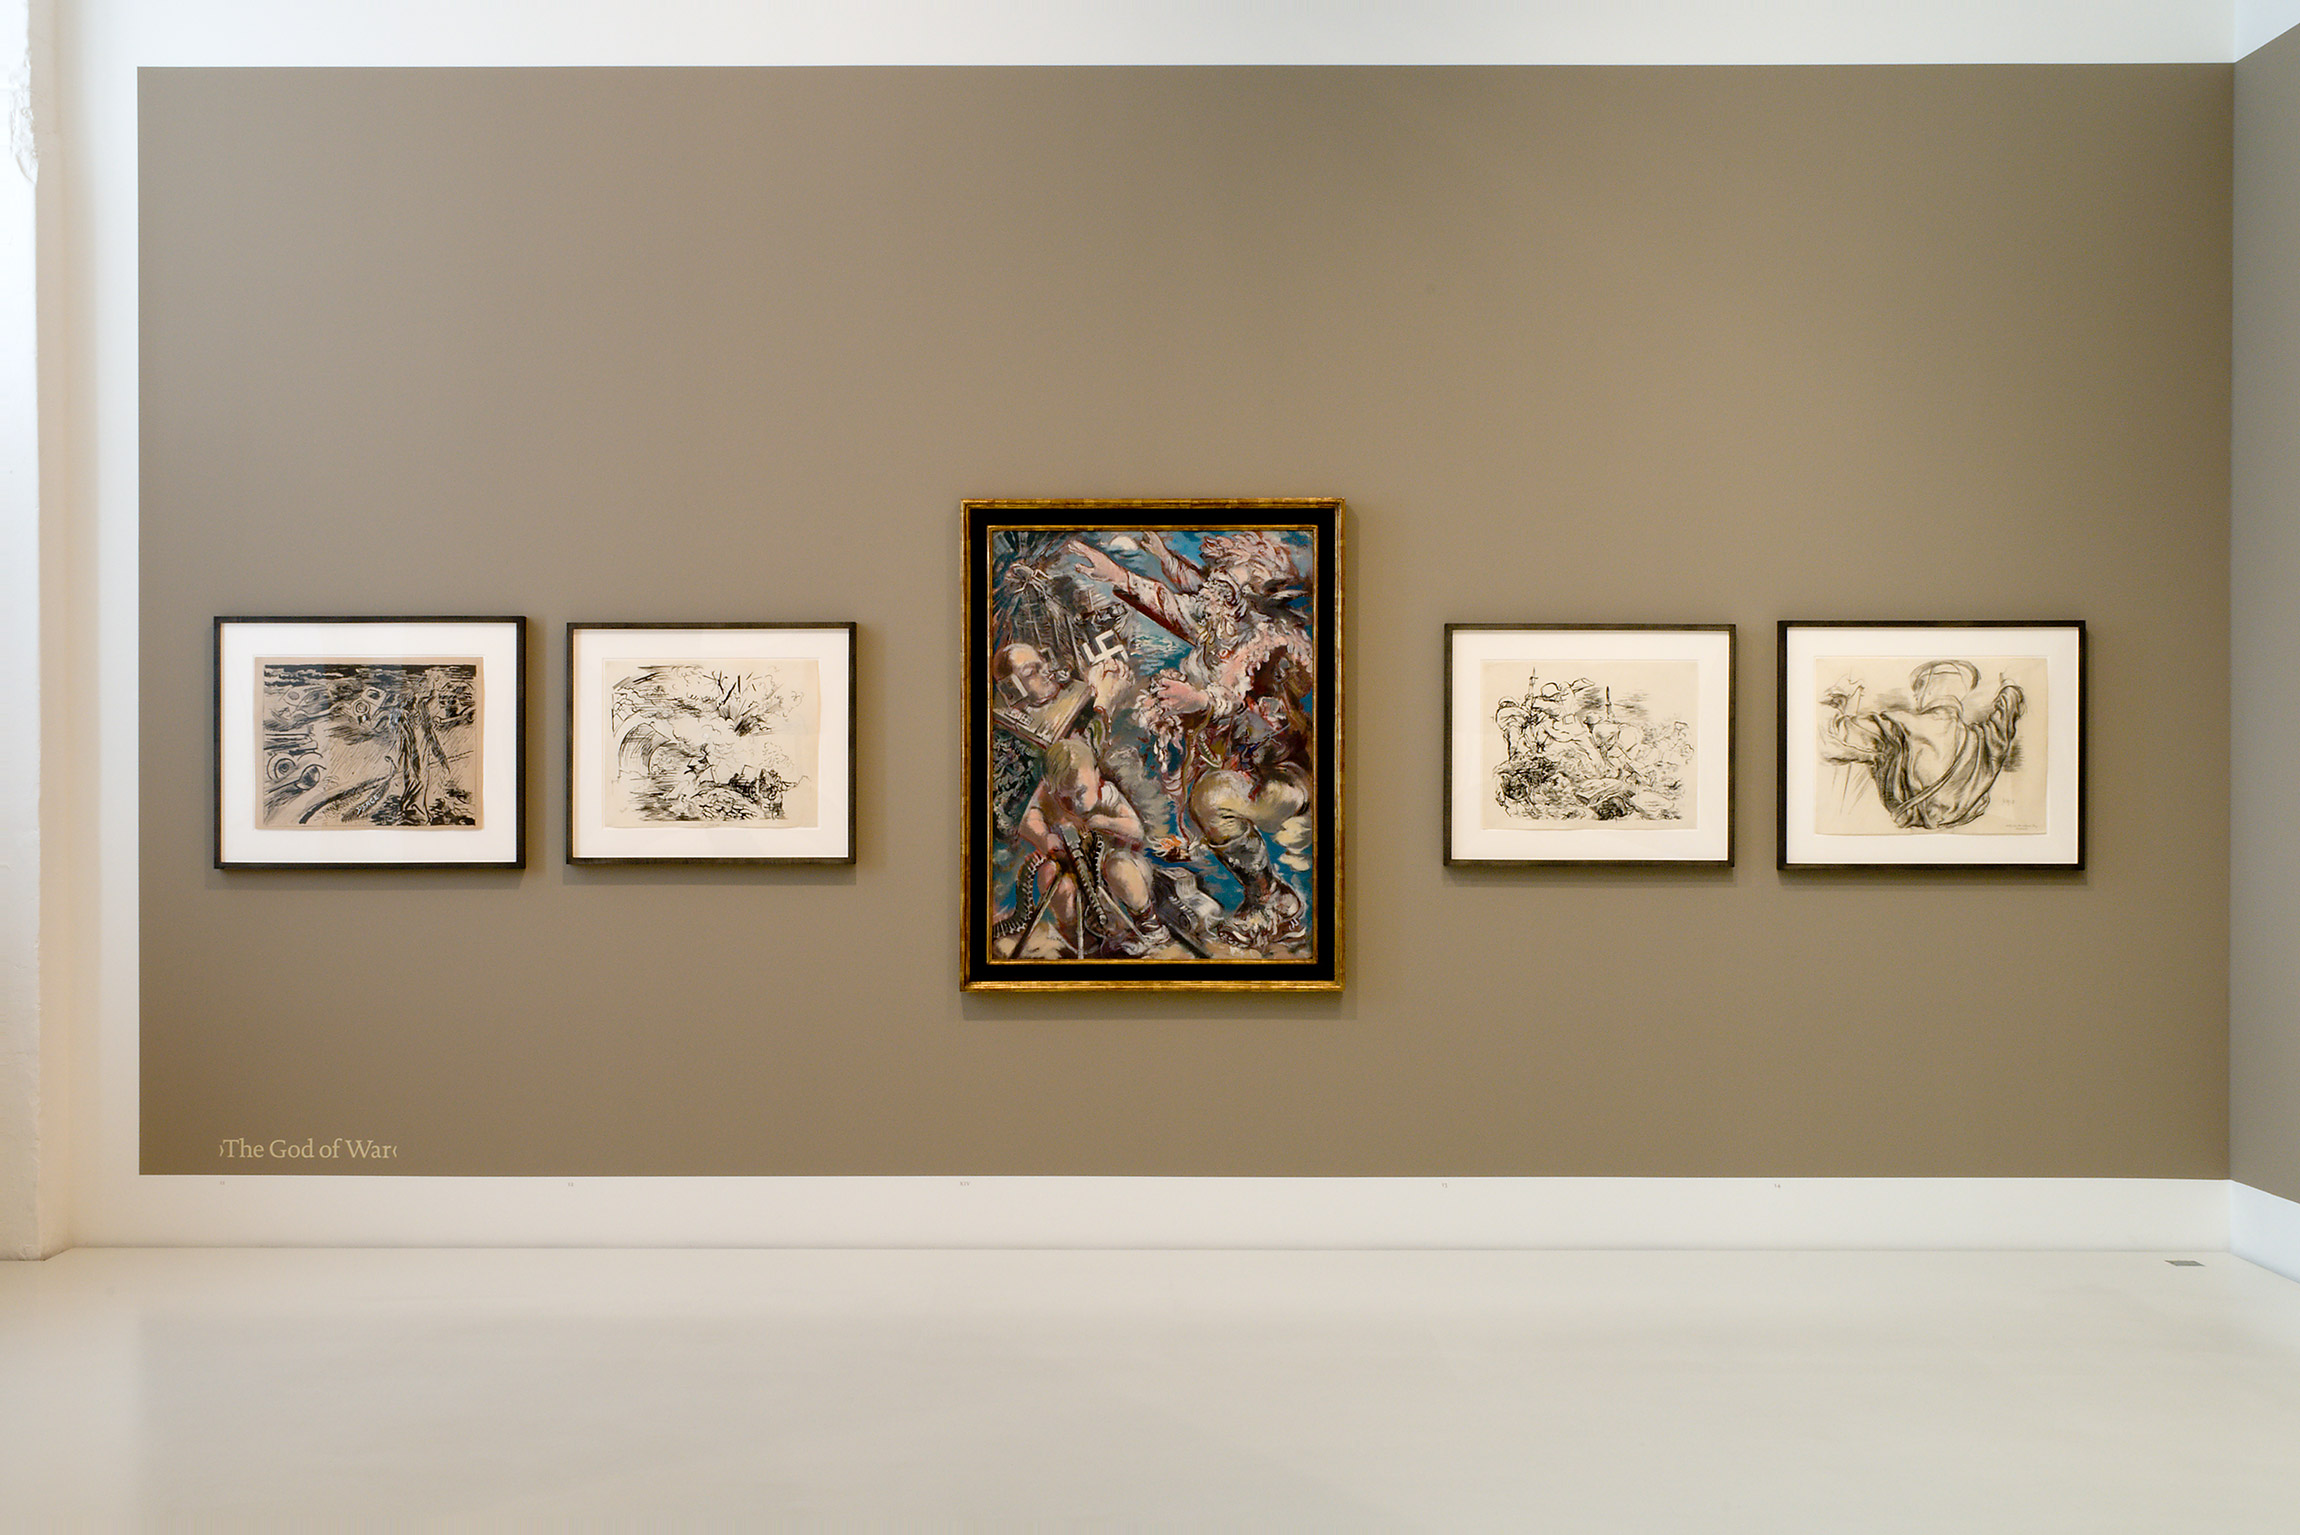 2009 George Grosz The Years in America 1933–1958